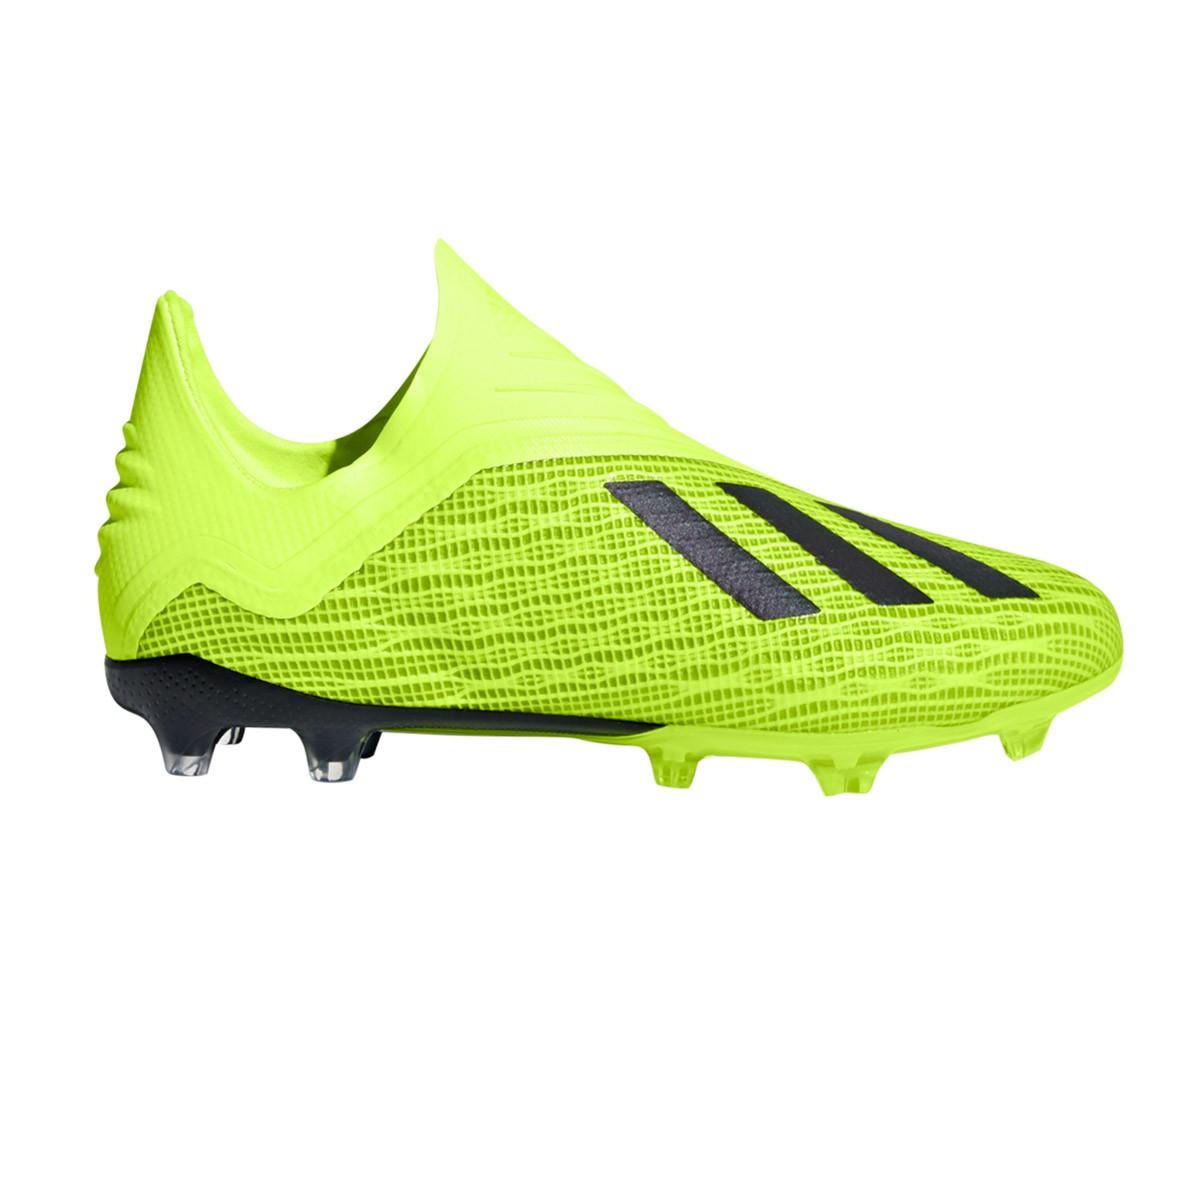 c7b7011c685c Football Boots adidas Kids X 18+ FG Solar yellow-Core black-White -  Football store Fútbol Emotion